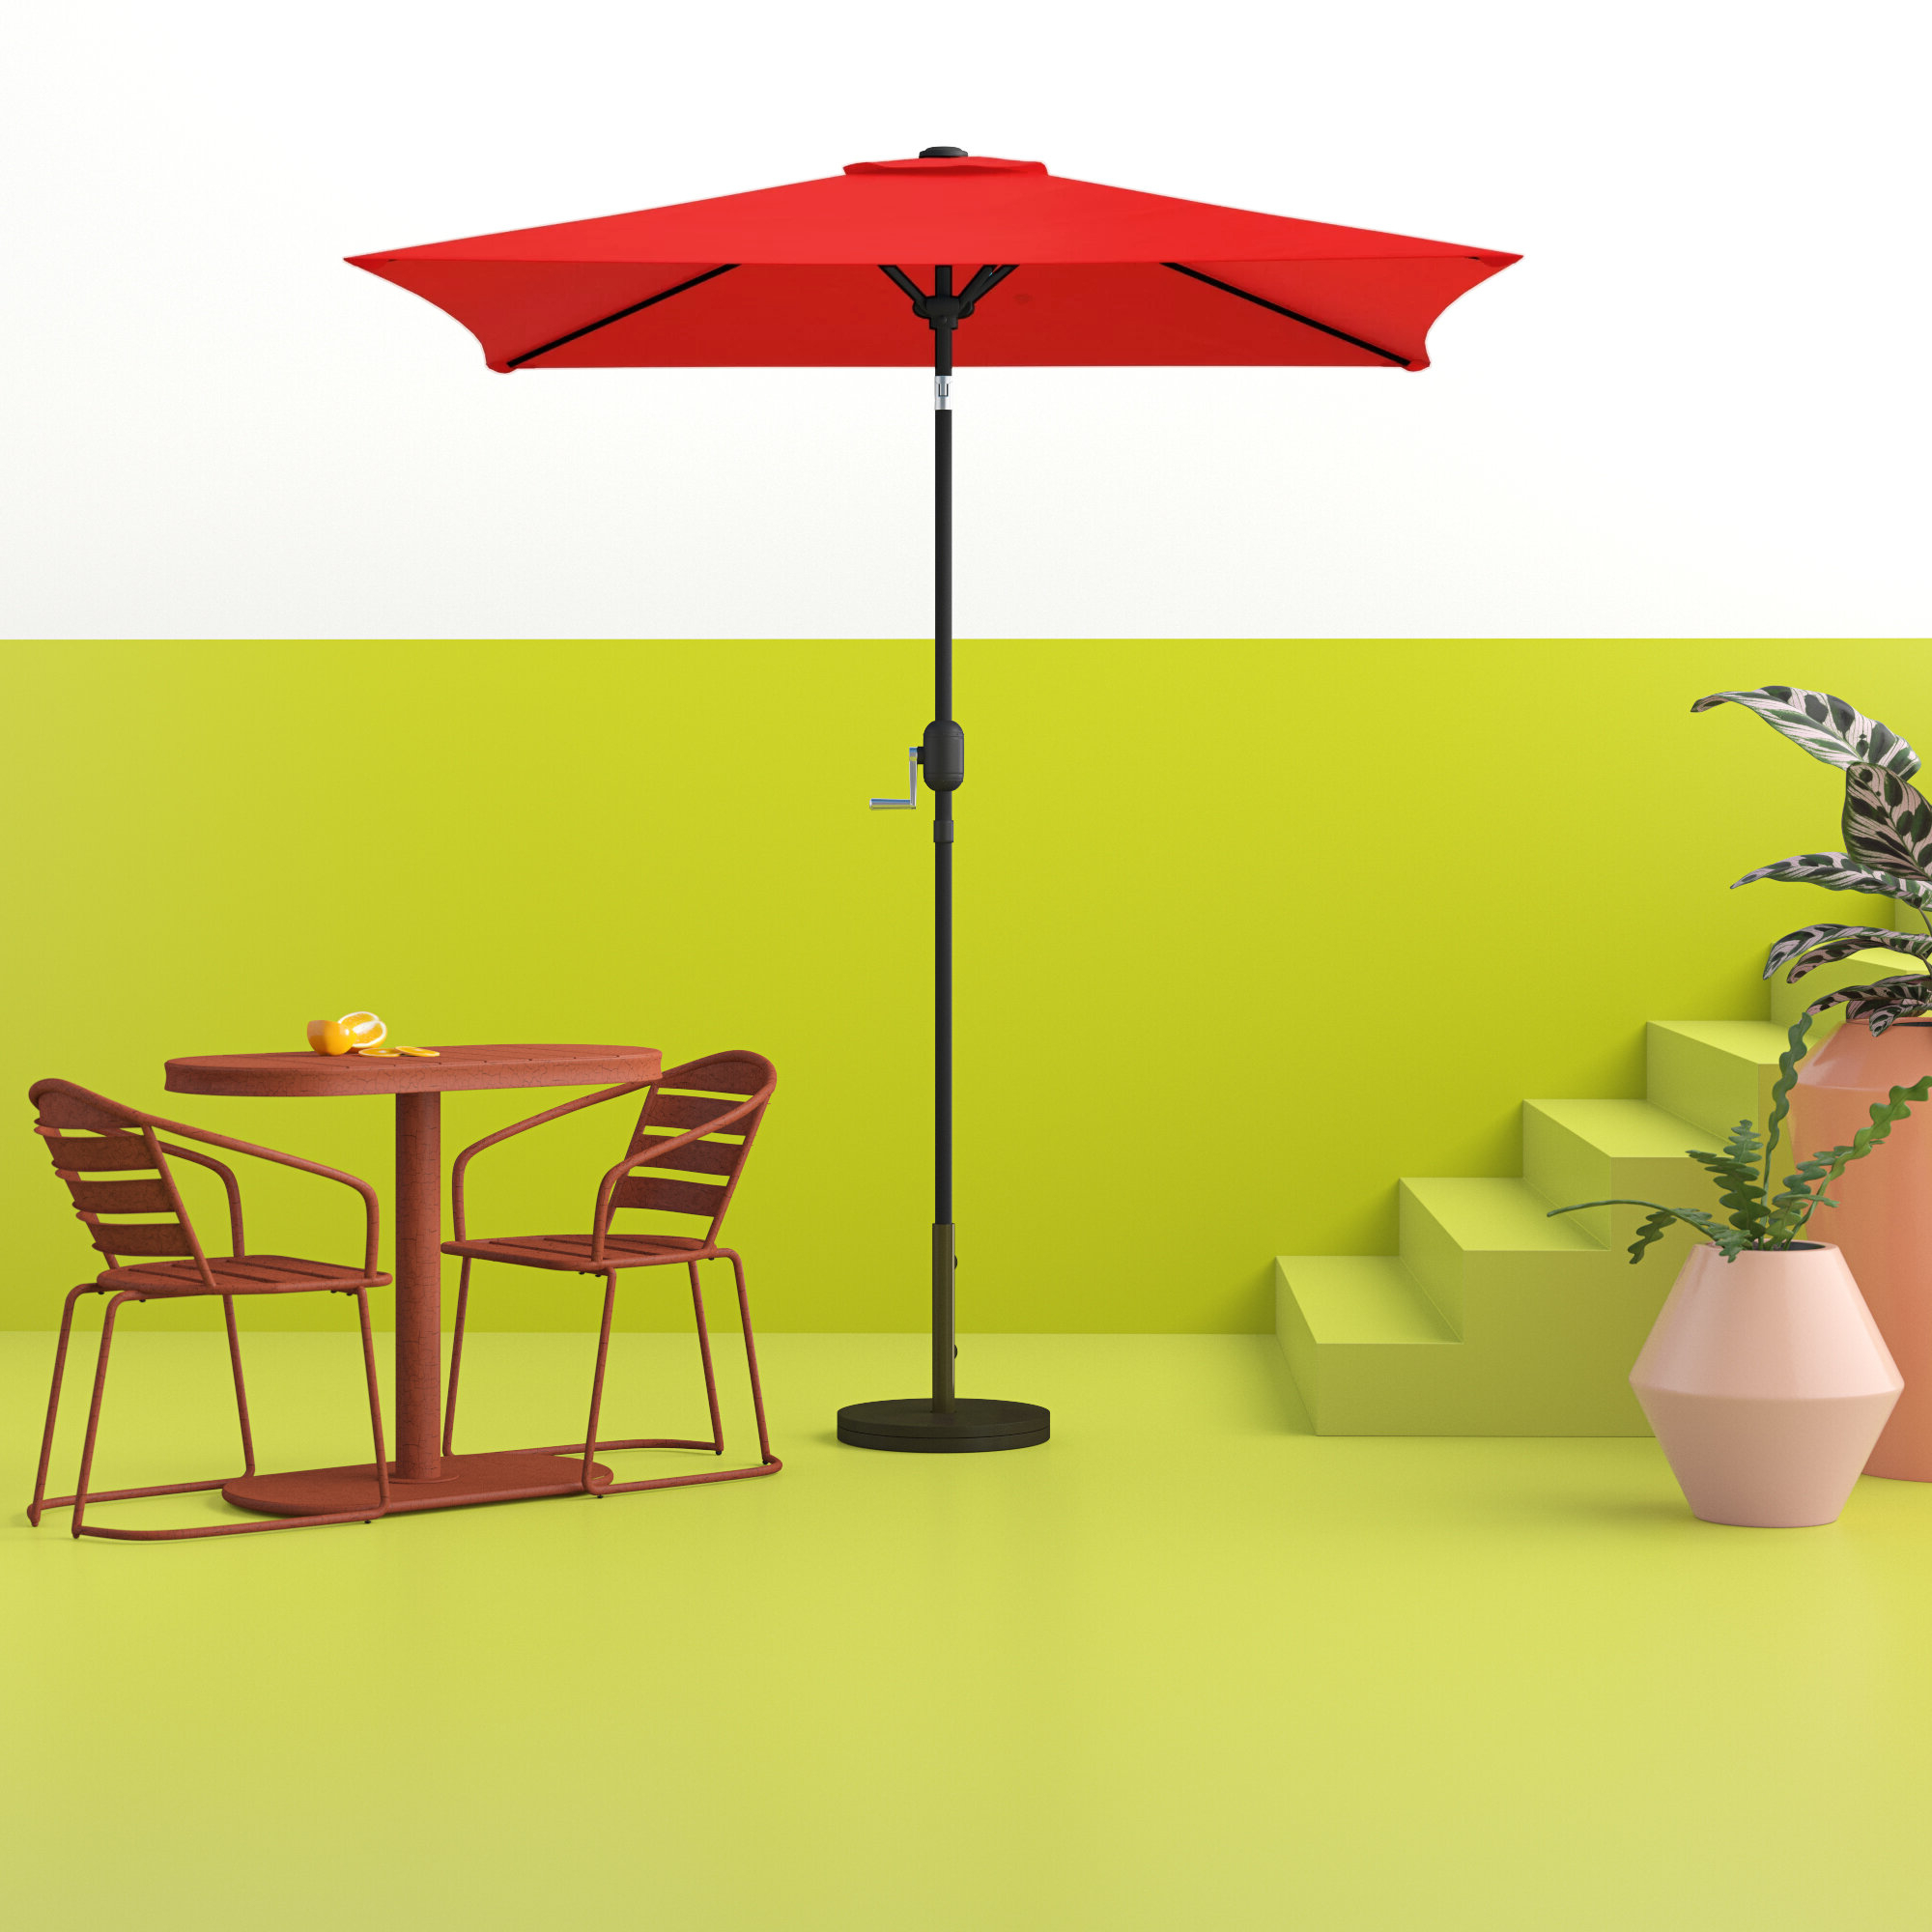 Bradford Patio 6.5' Square Market Umbrella With Regard To Most Recent Maglione Fabric 4Cantilever Umbrellas (Gallery 10 of 20)